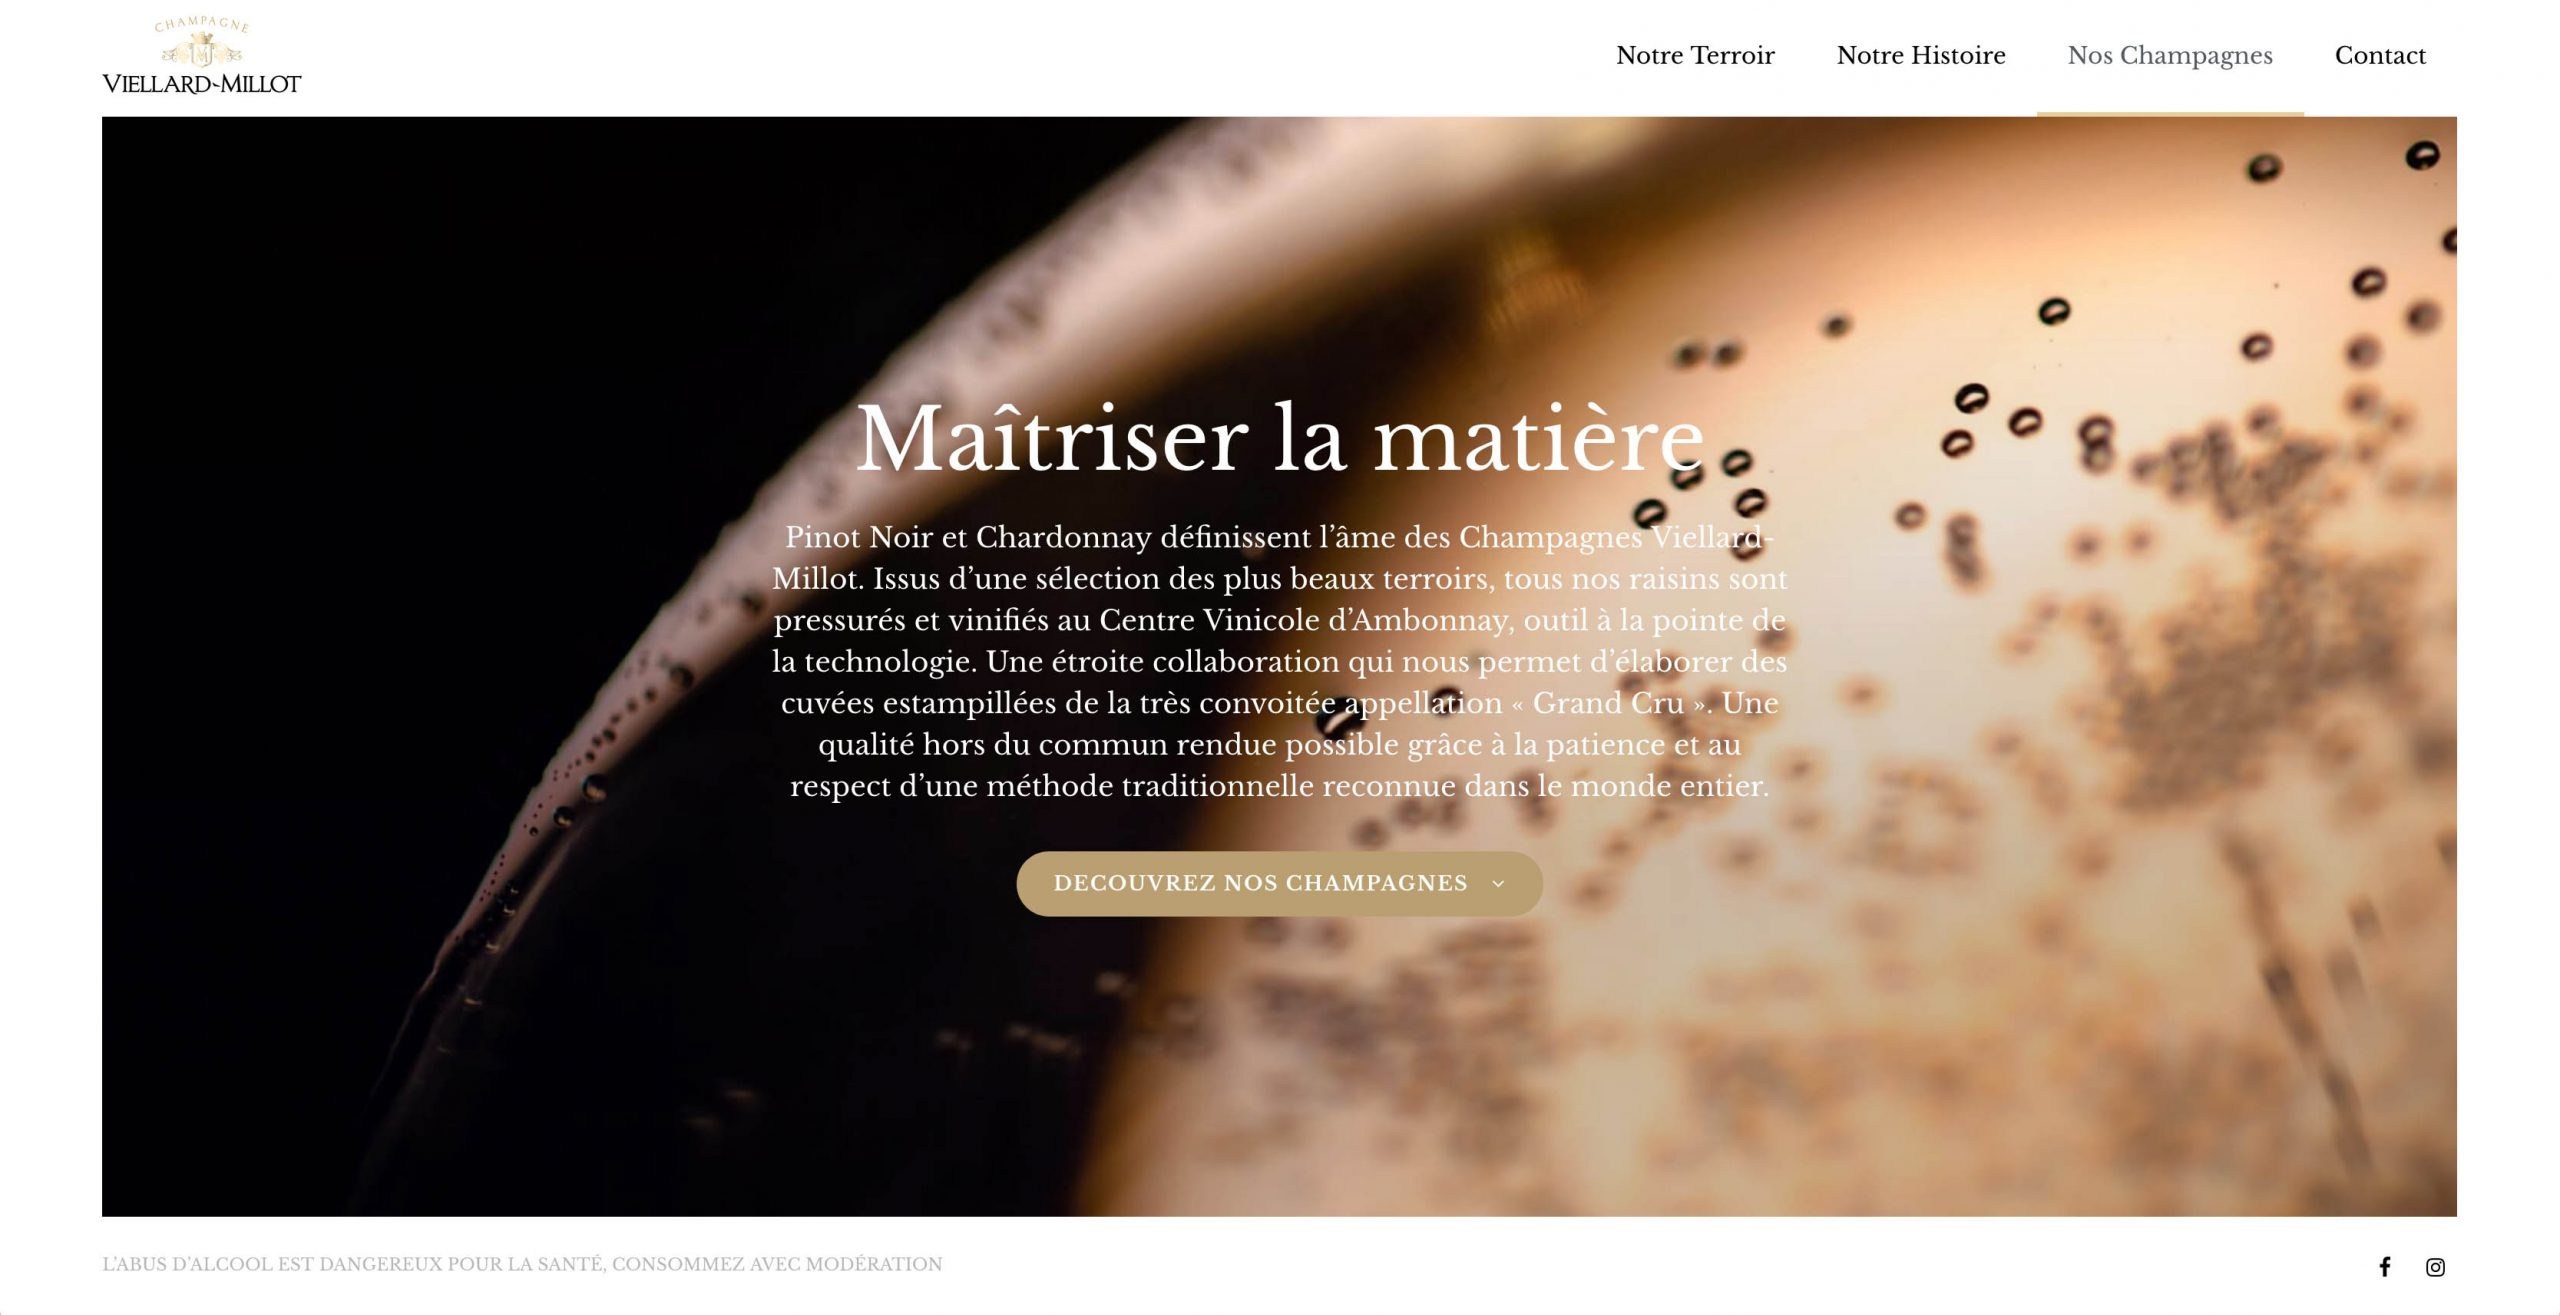 Site Internet du Champagne Viellard-Millot - Agence Discovery